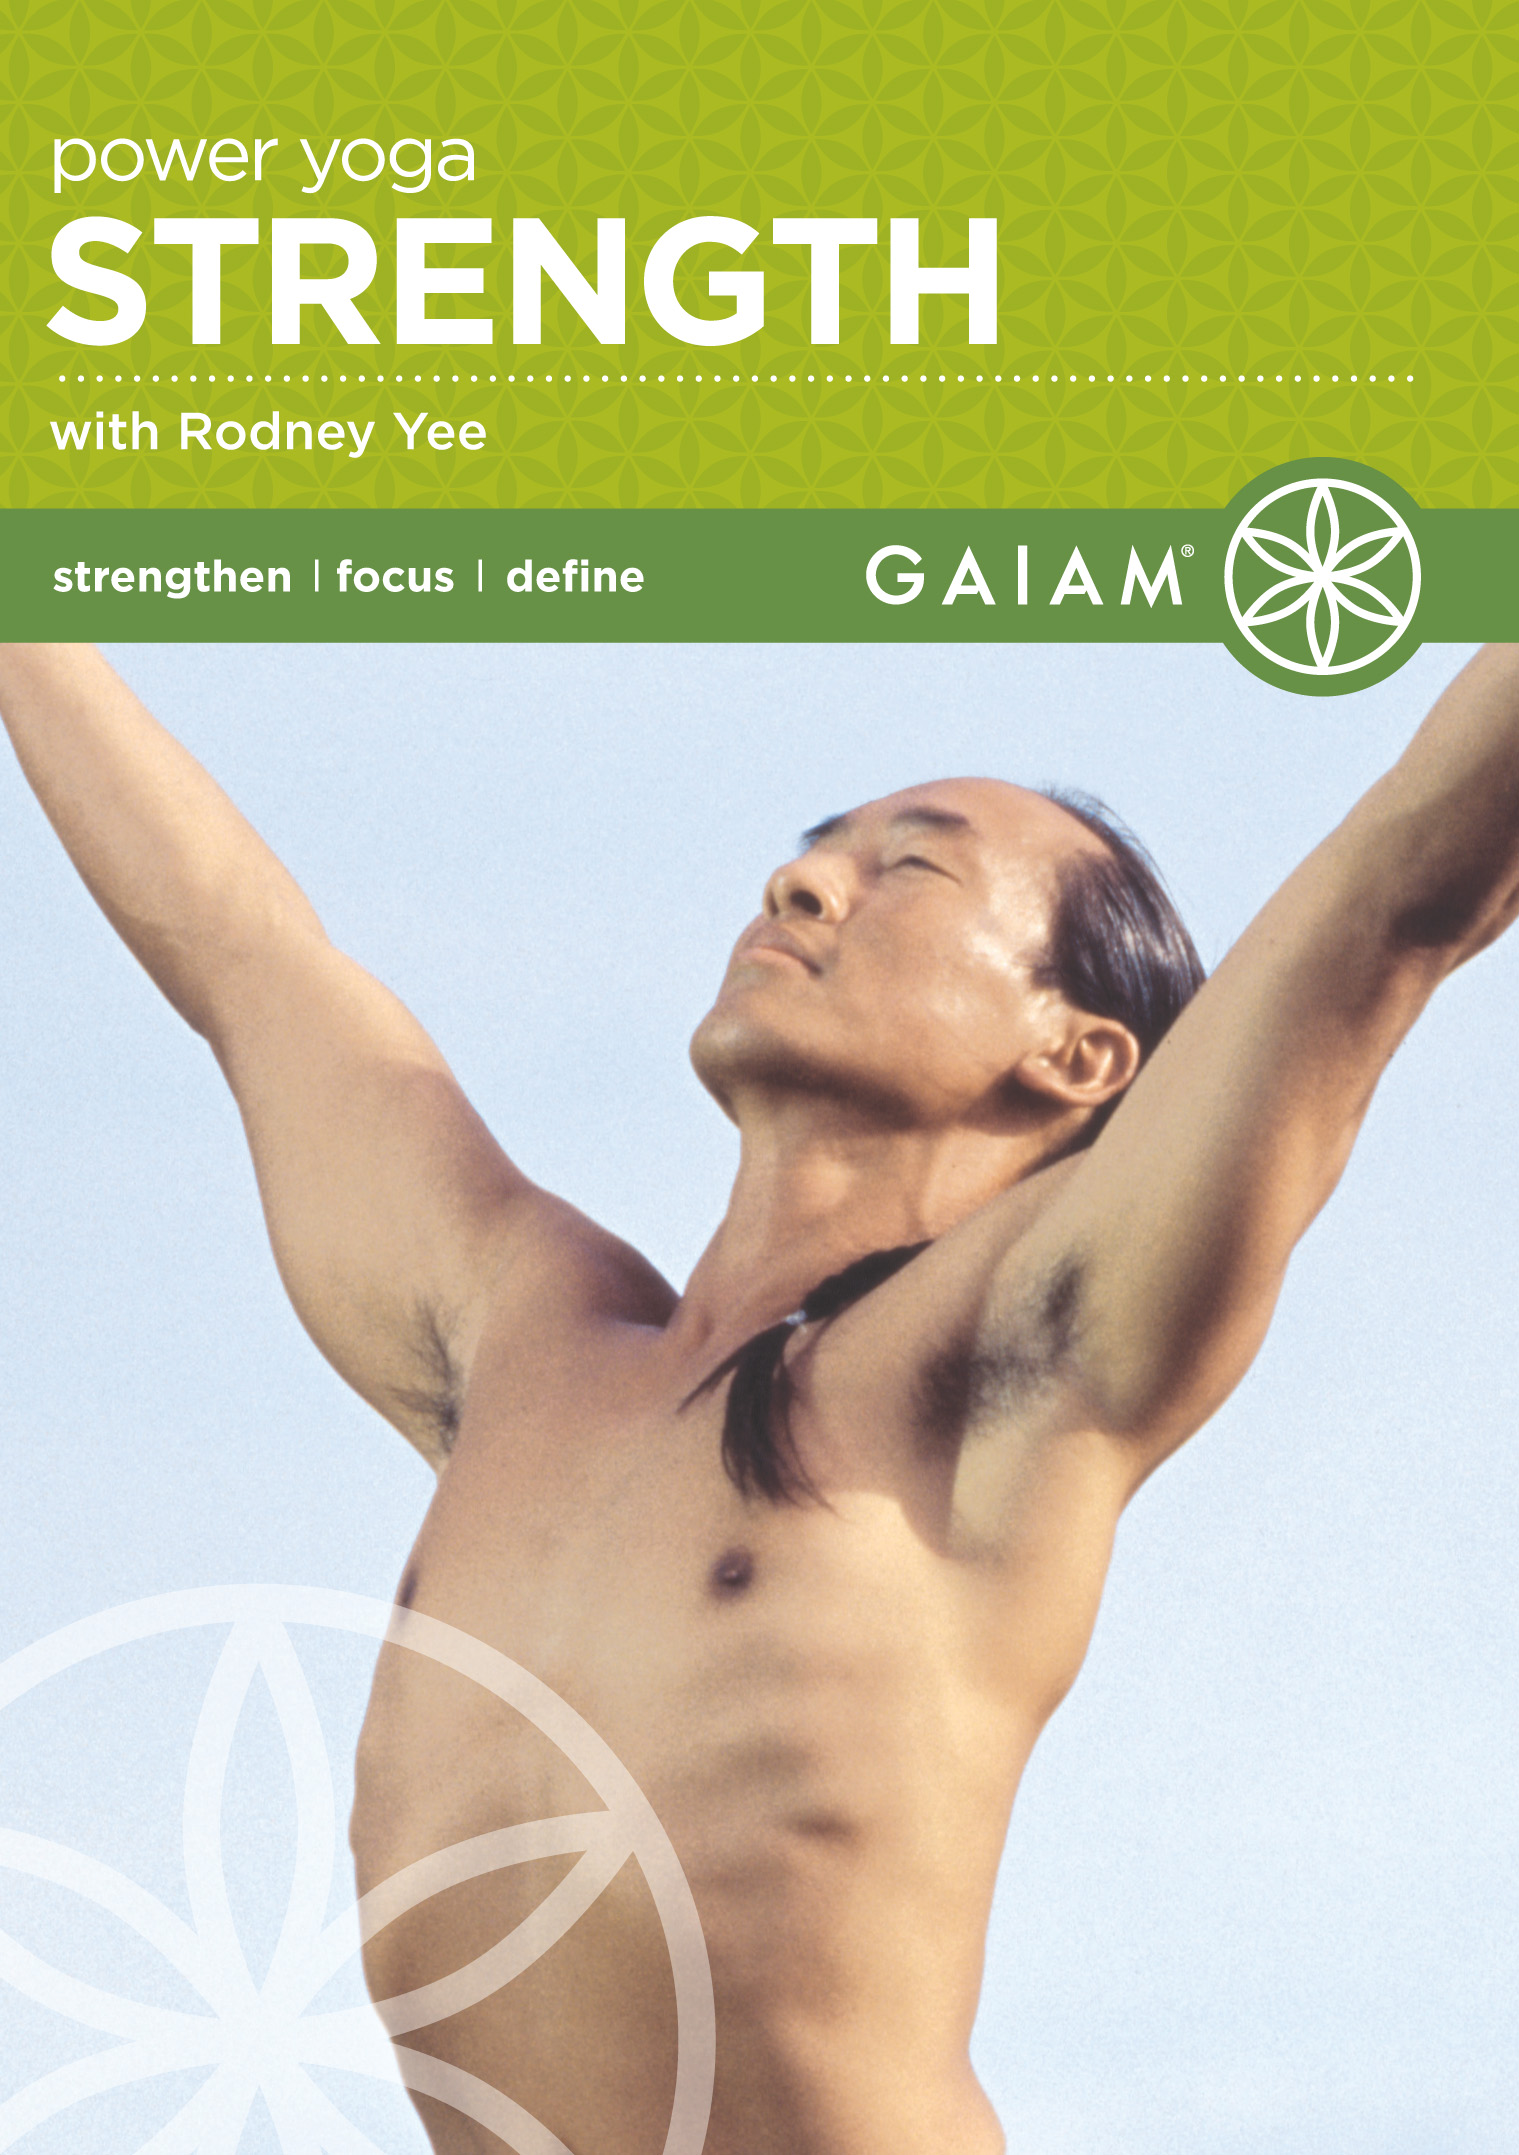 Power Yoga: Strength